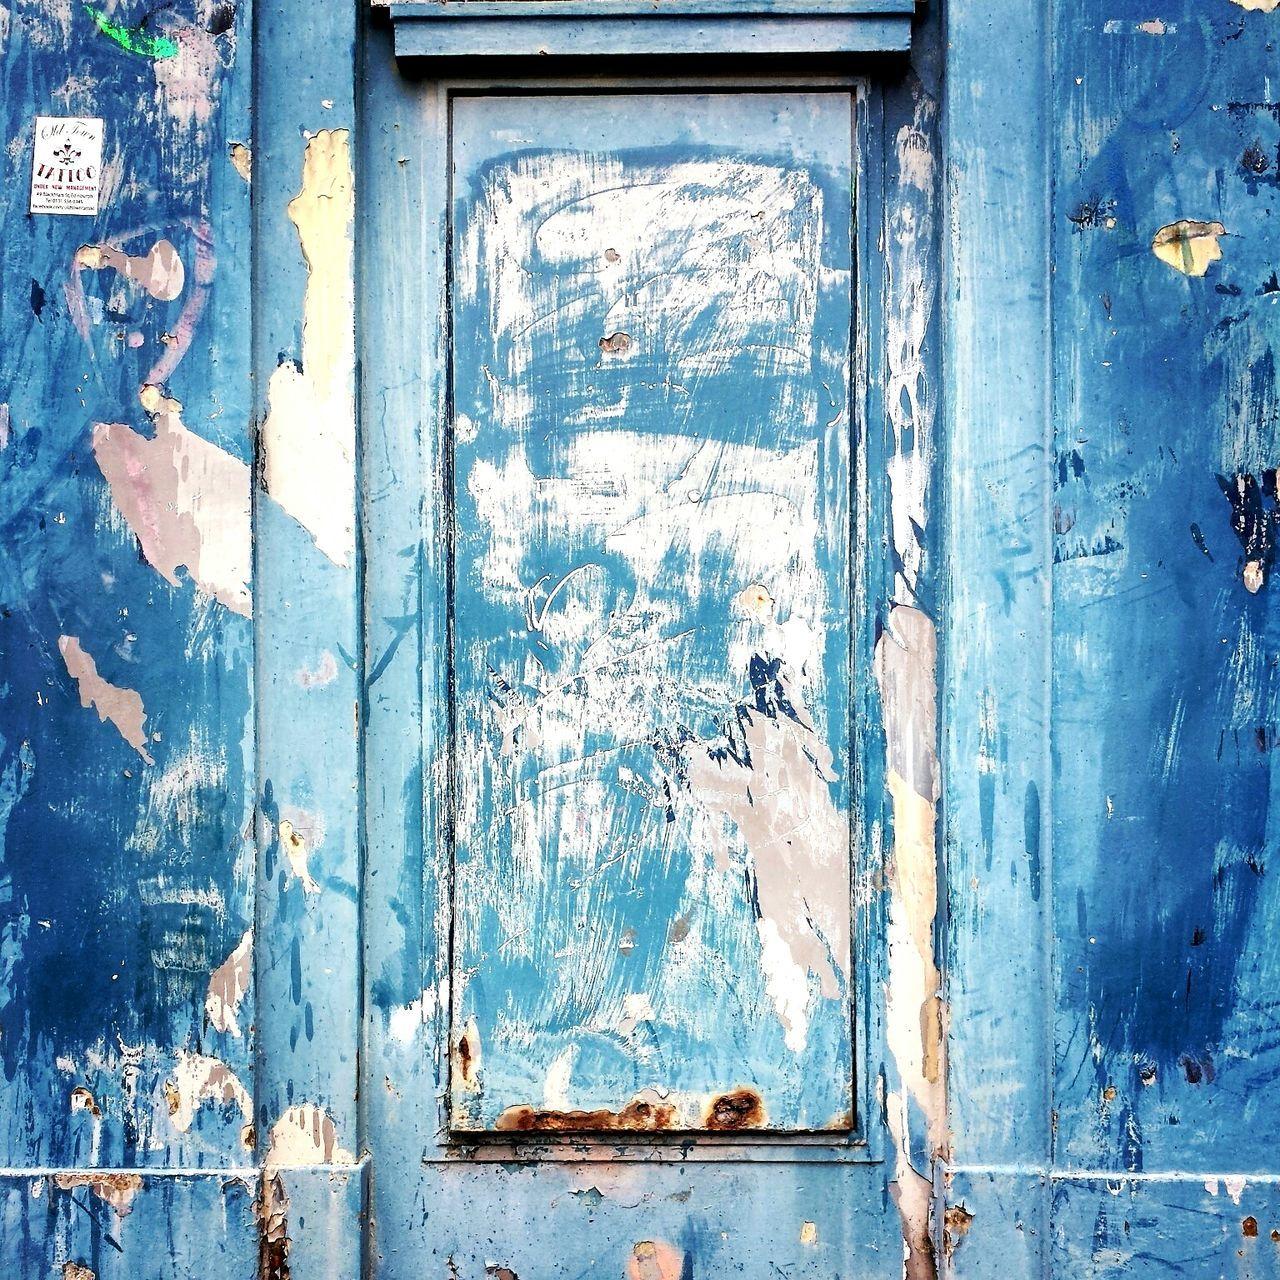 Wall Paint Decay Unintentionalart Accidentalart Abstract Unintentional Art Accidental Art